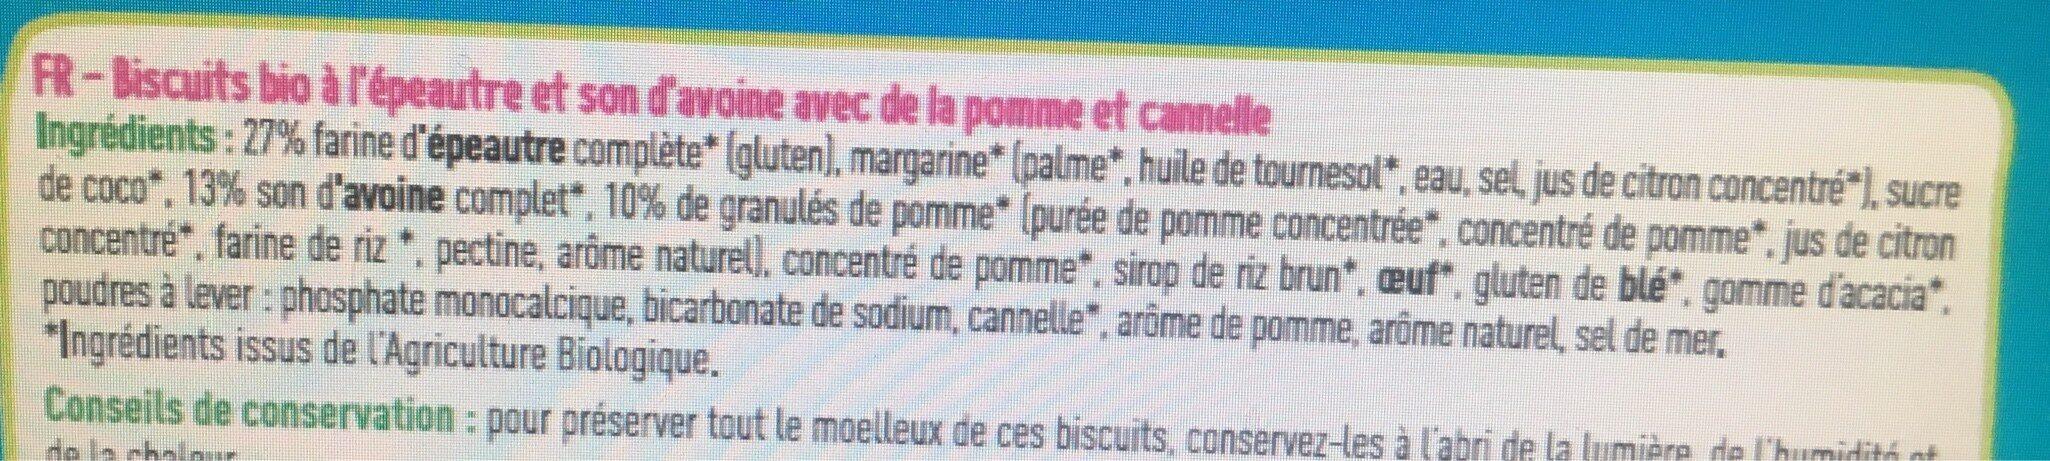 Biscuits moelleux pomme cannelle bio - Ingrédients - fr